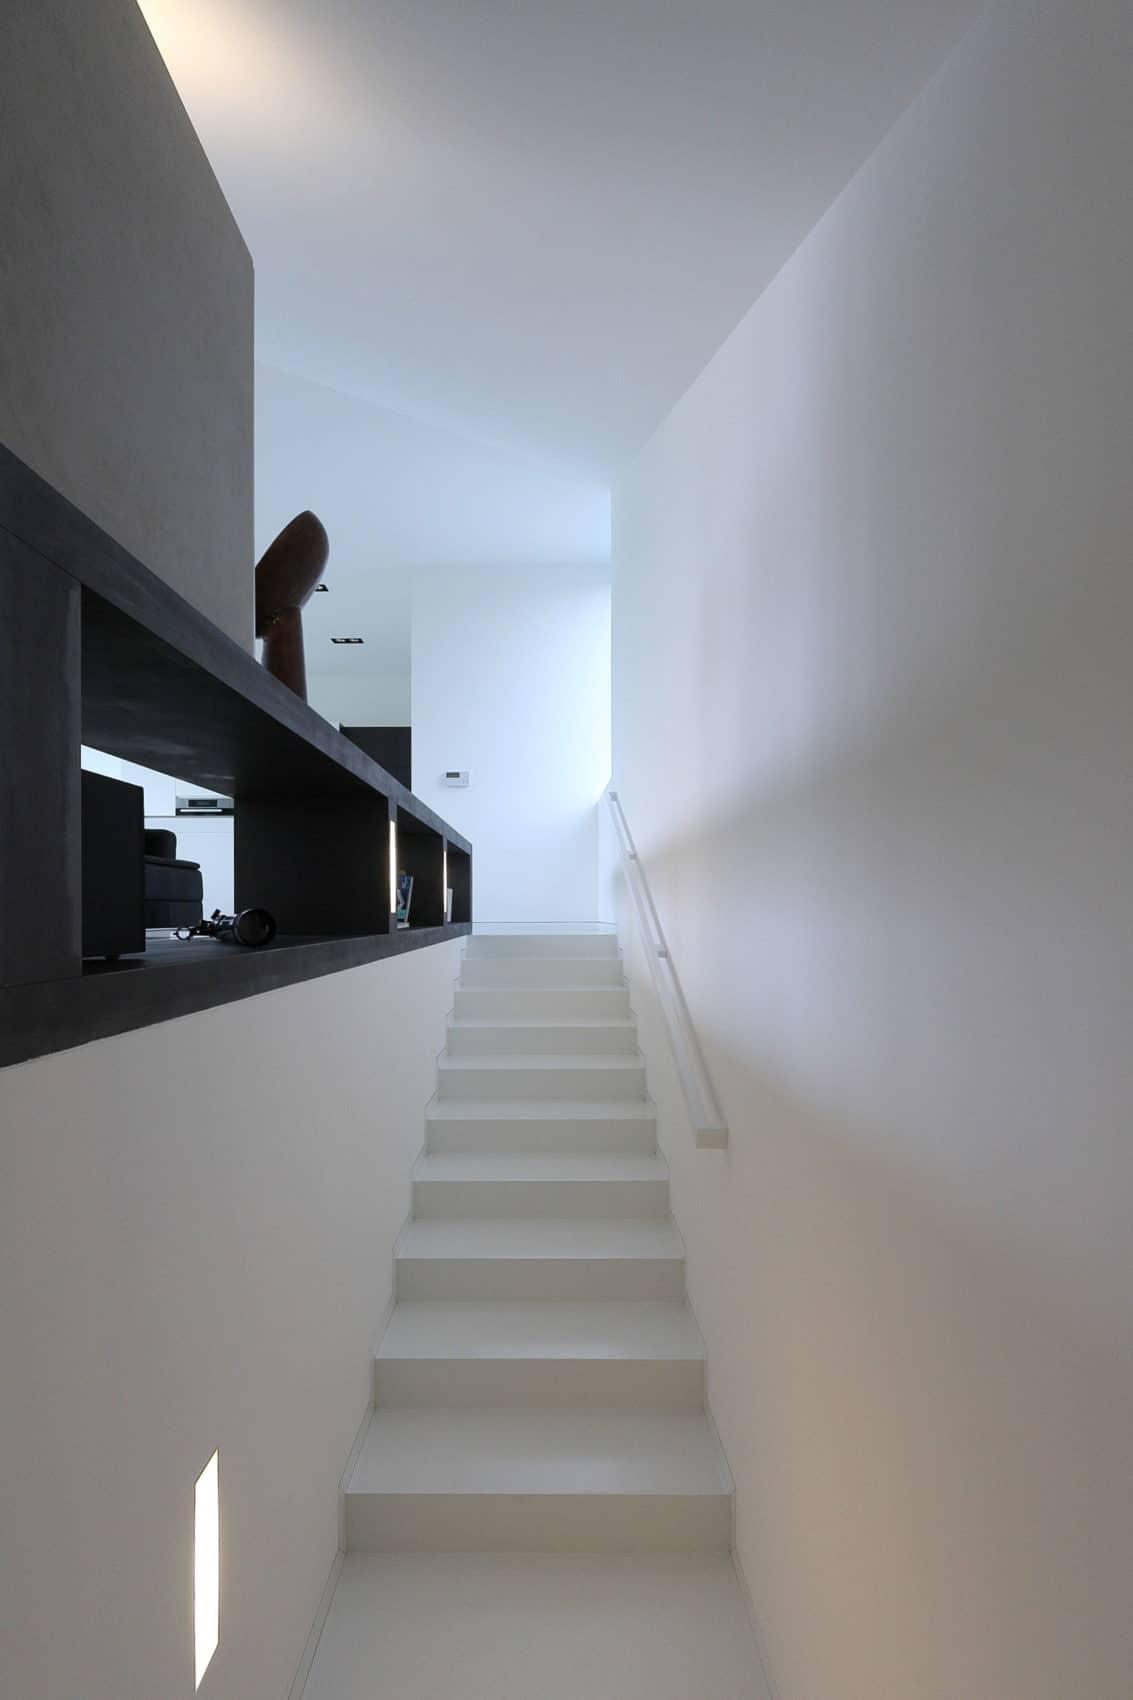 House K2 by Pauliny Hovorka Architekti (10)